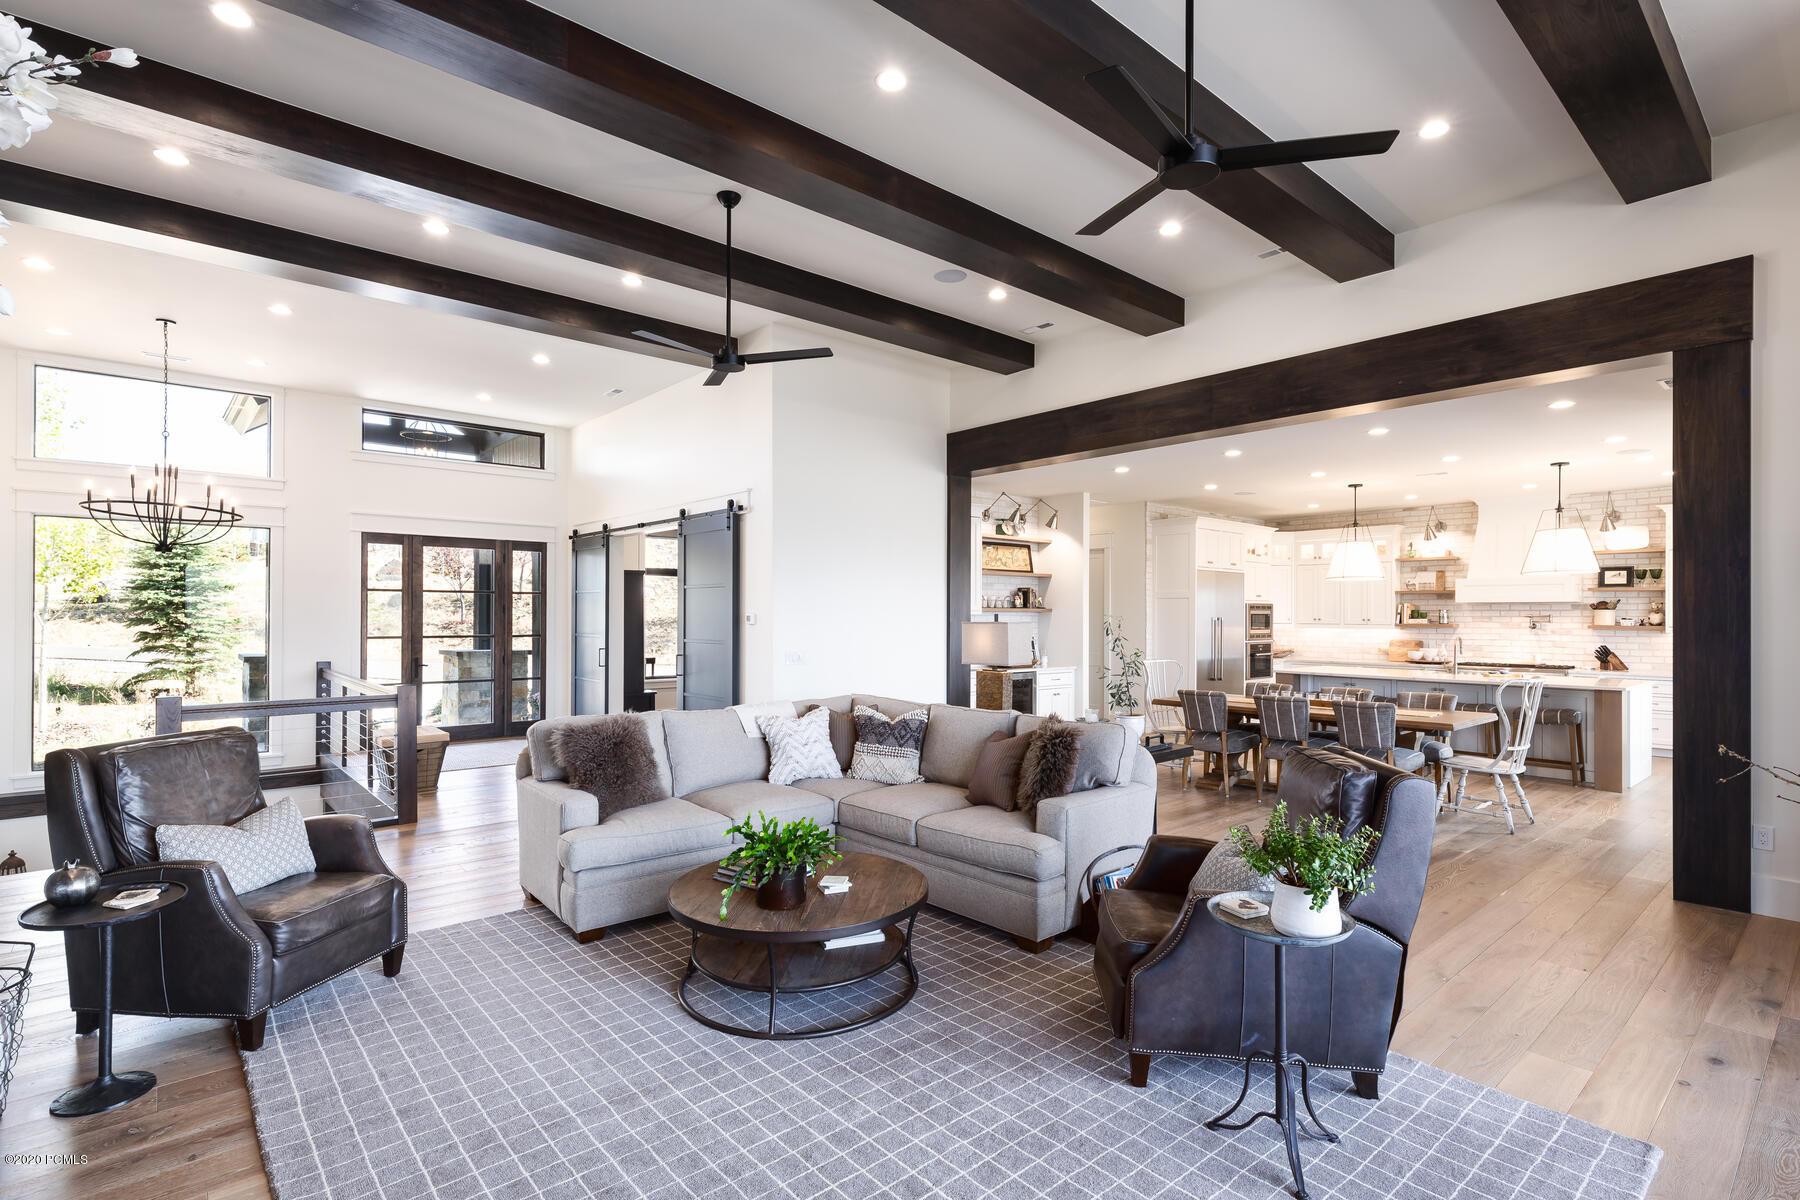 89 Vista Ridge Road, Kamas, Utah 84036, 4 Bedrooms Bedrooms, ,5 BathroomsBathrooms,Single Family,For Sale,Vista Ridge,12004019